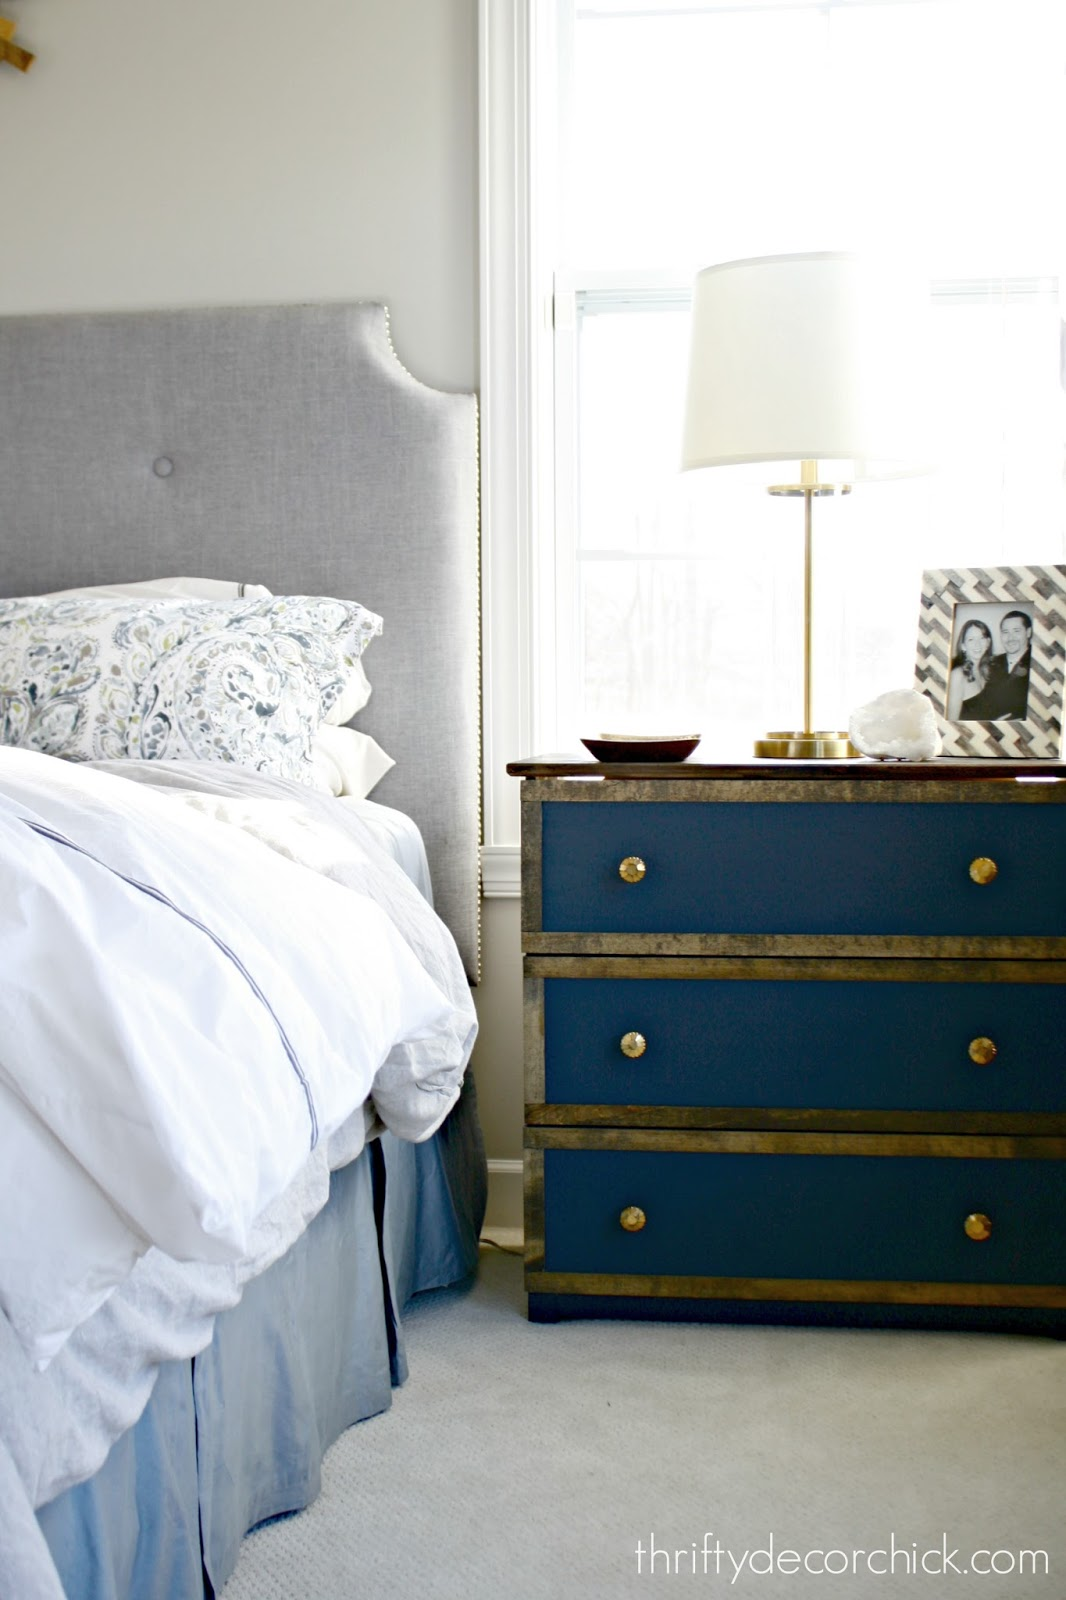 Small dresser as nightstand